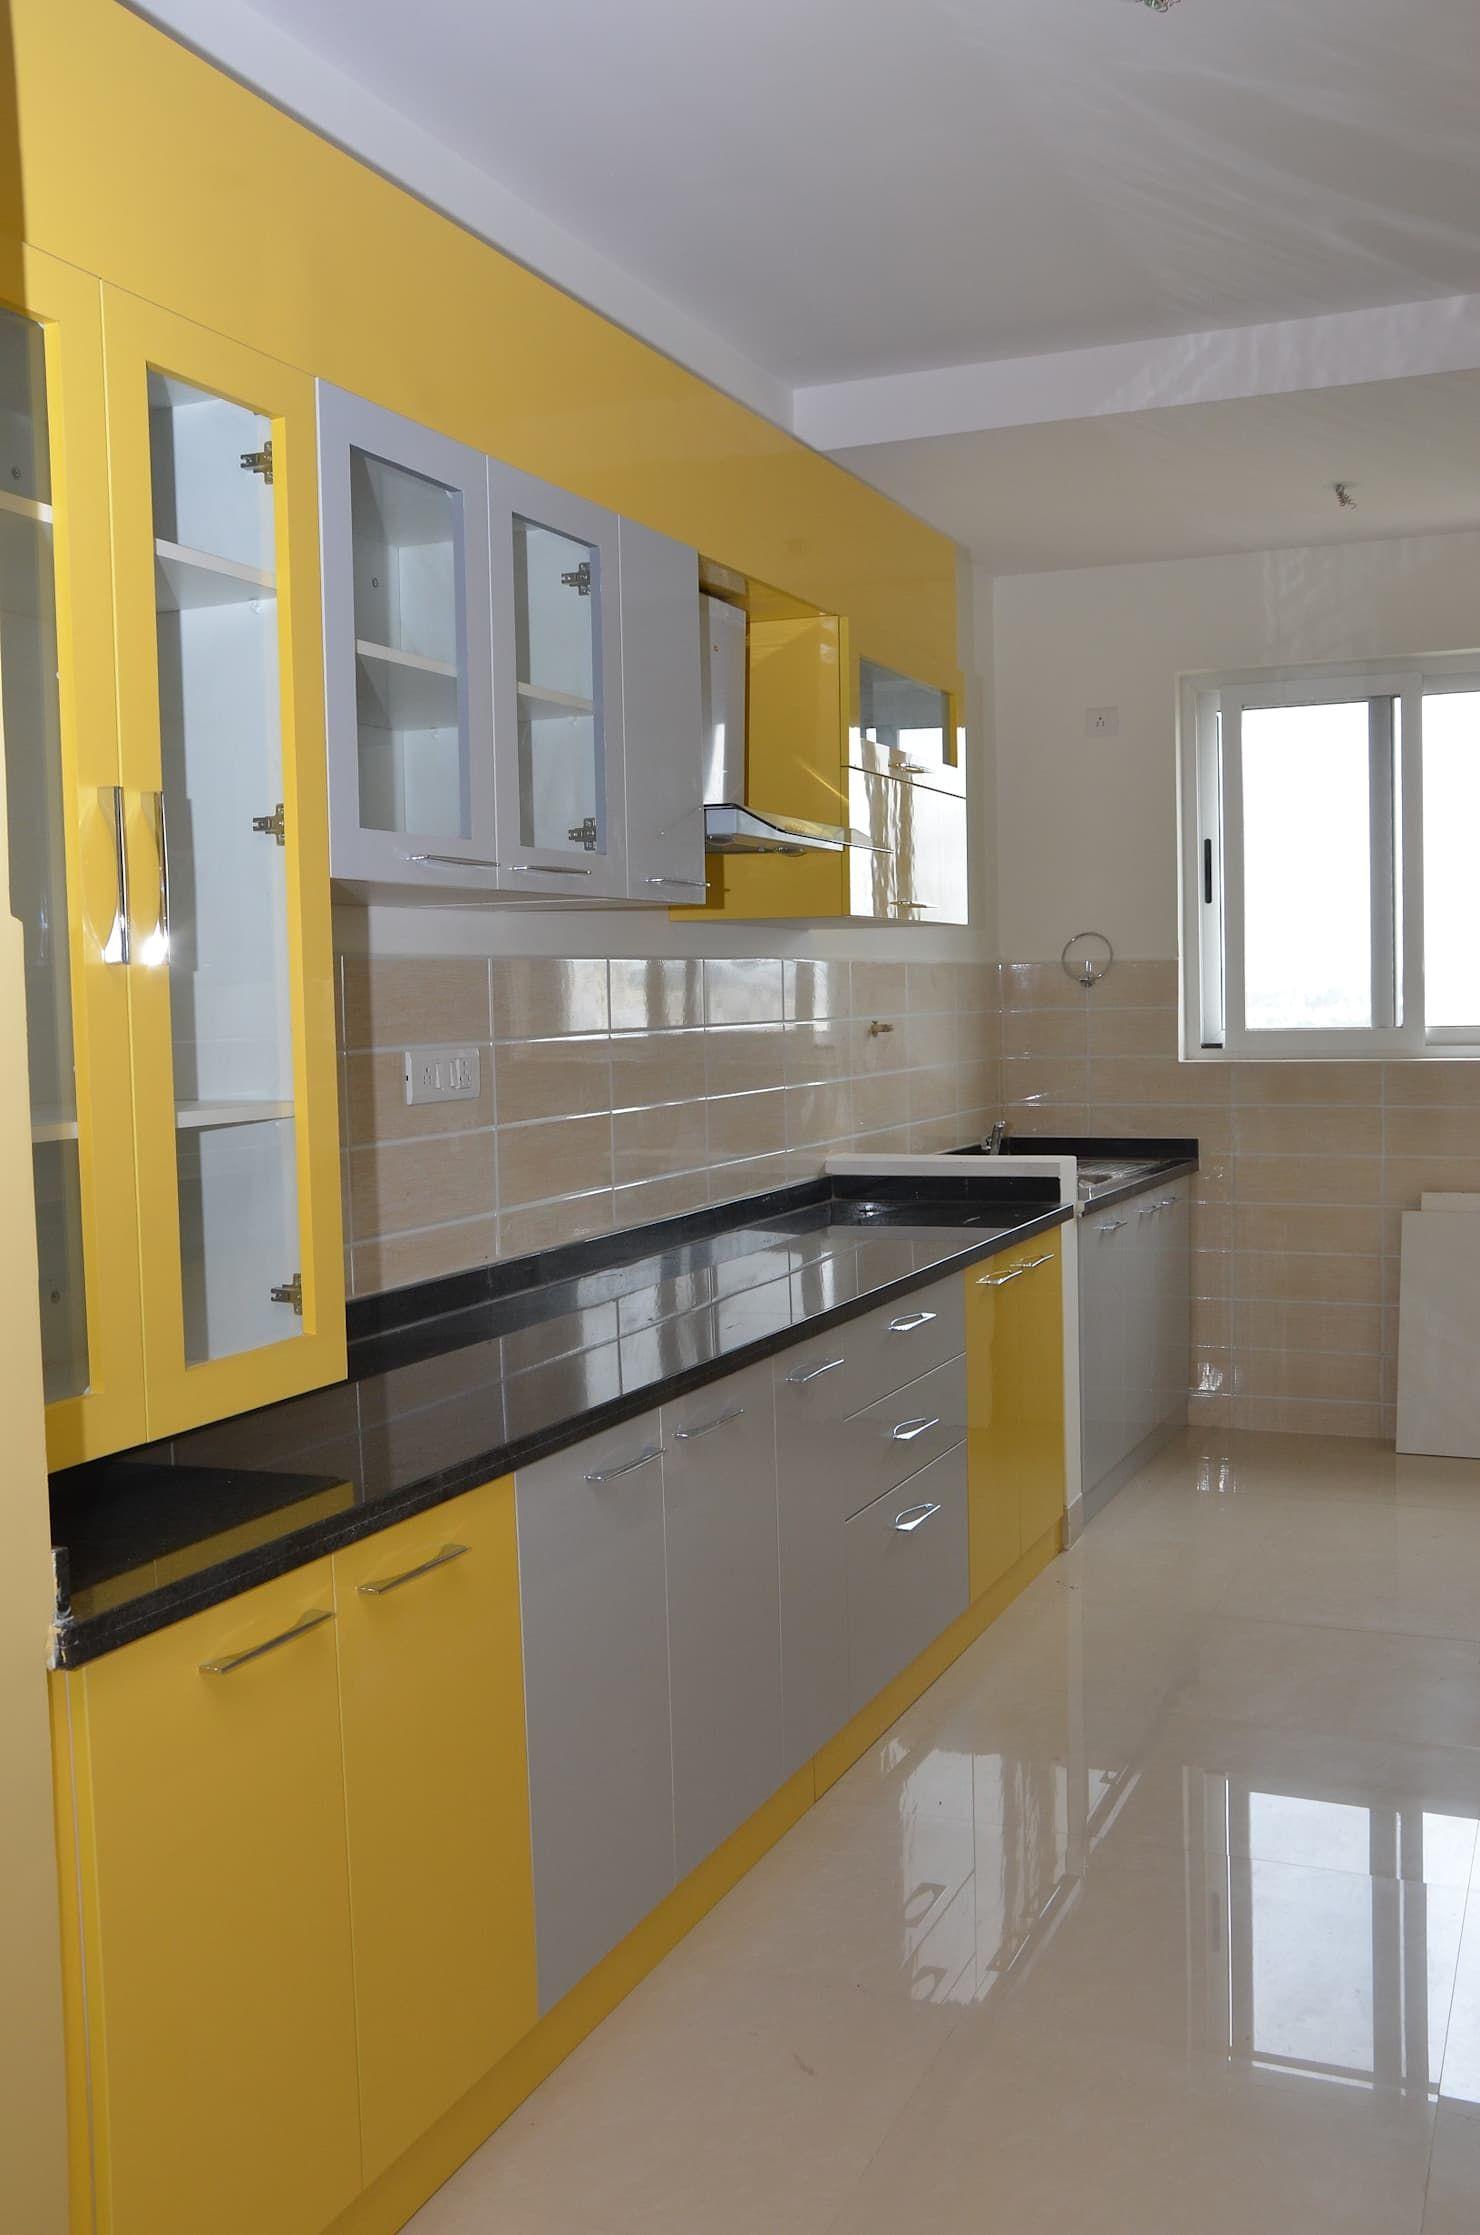 D'life home interiors - kottayam kottayam kerala dhananjaya dhanuindustry on pinterest